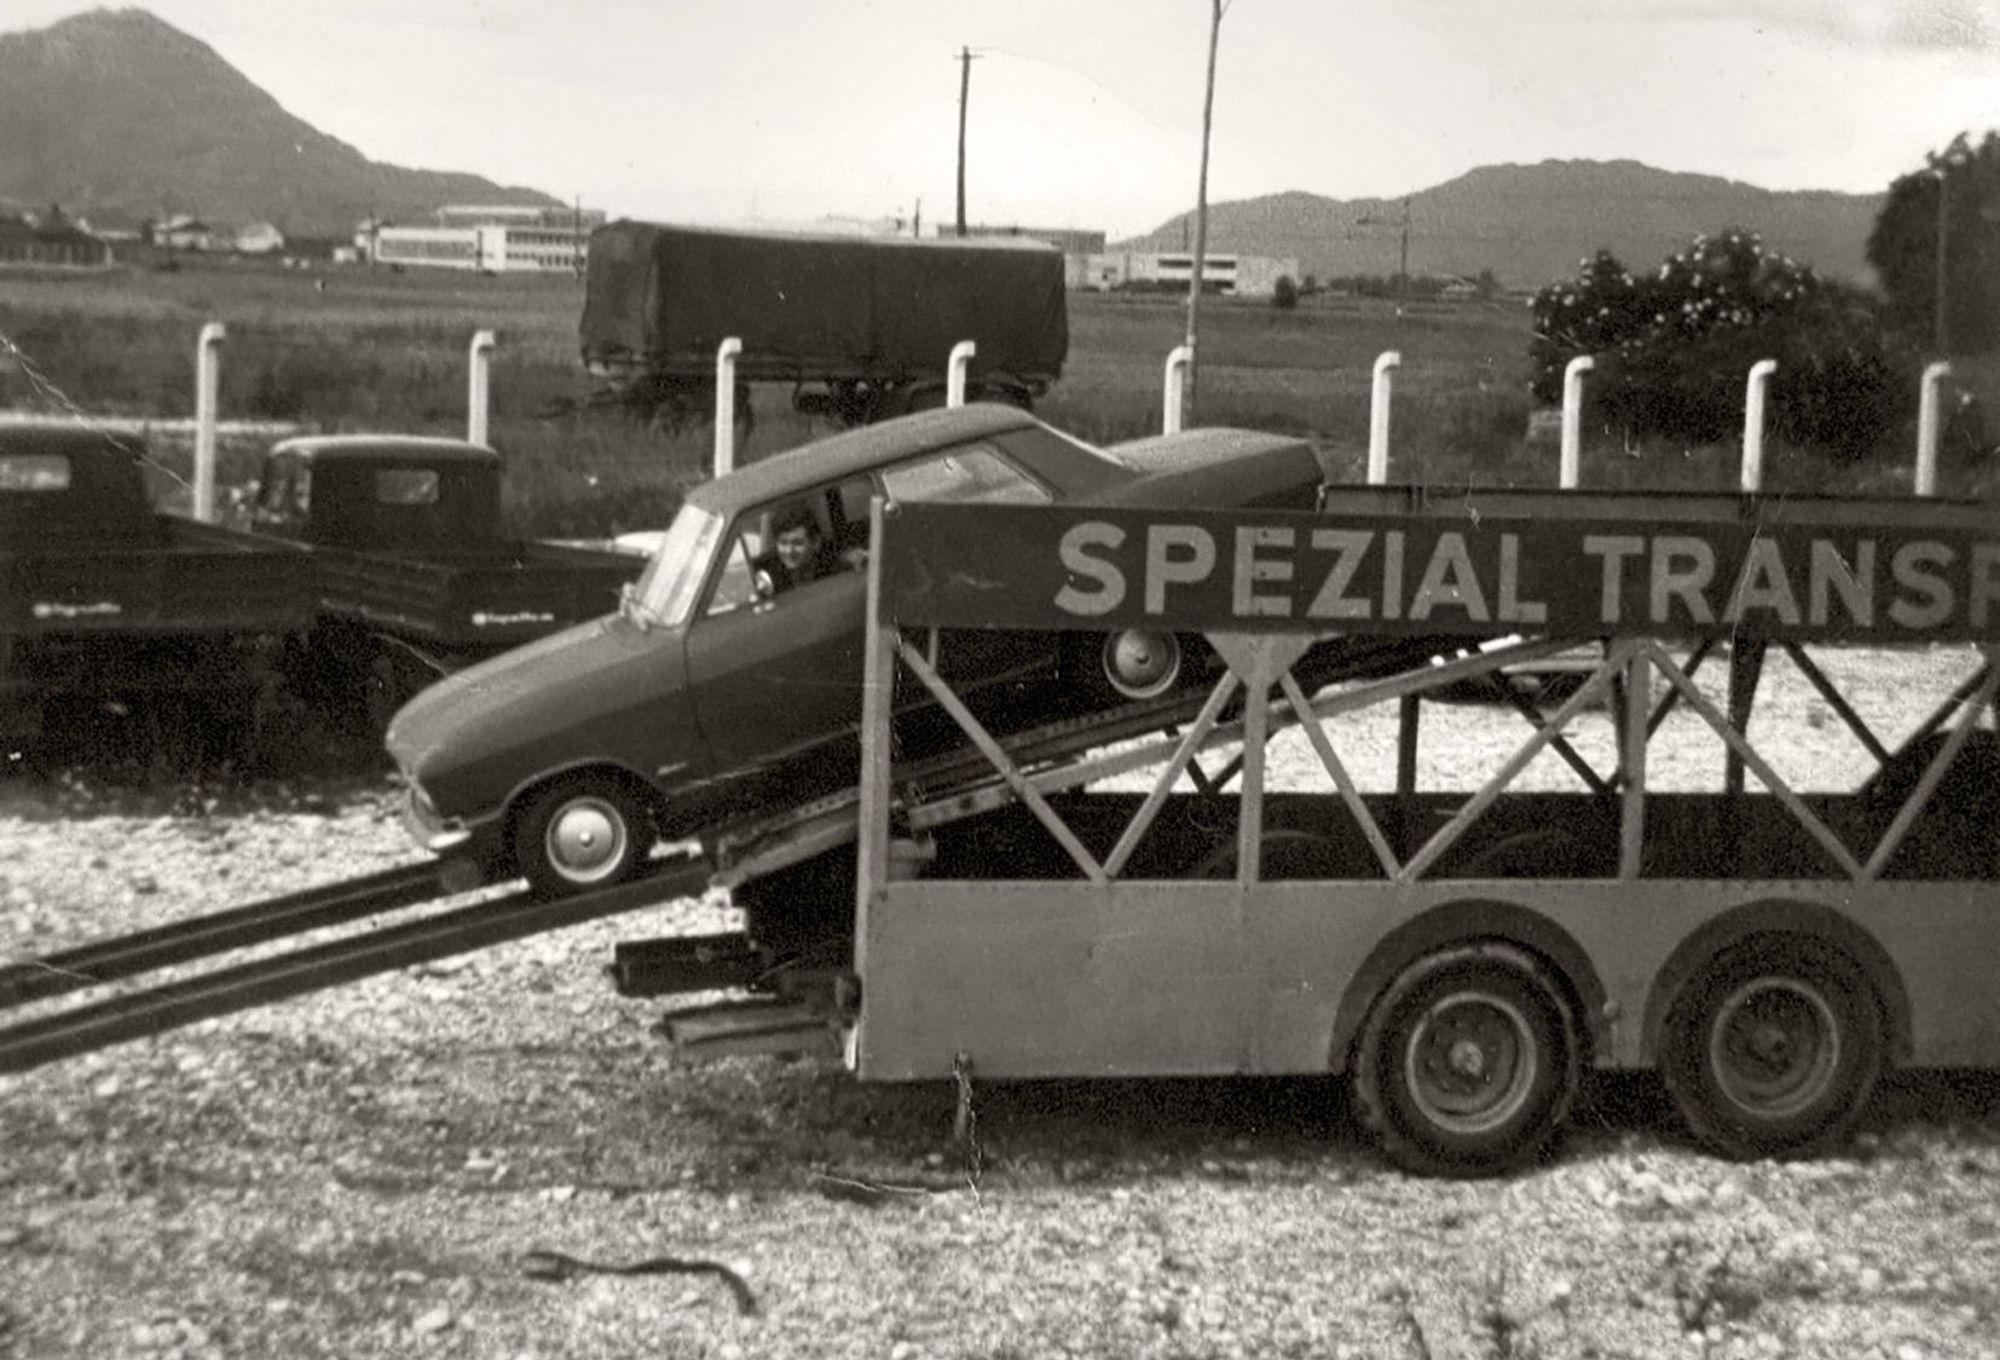 Classic-Car-Center-transport